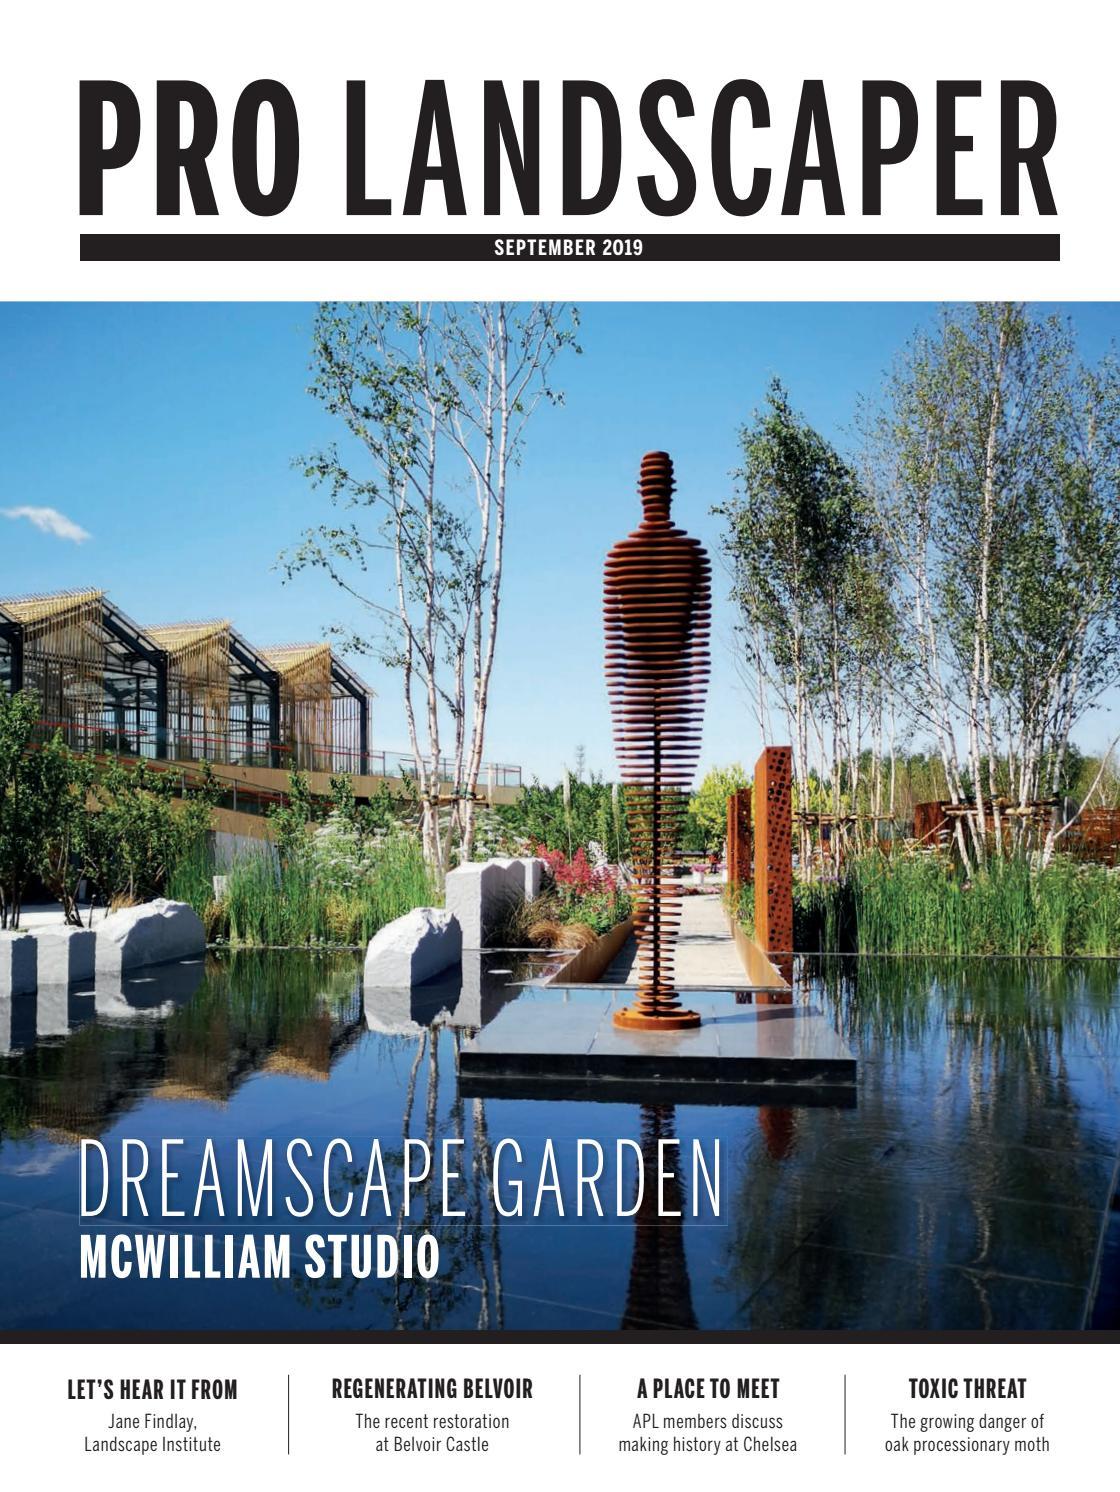 Pro Landscaper September 2019 By Eljays44 Issuu